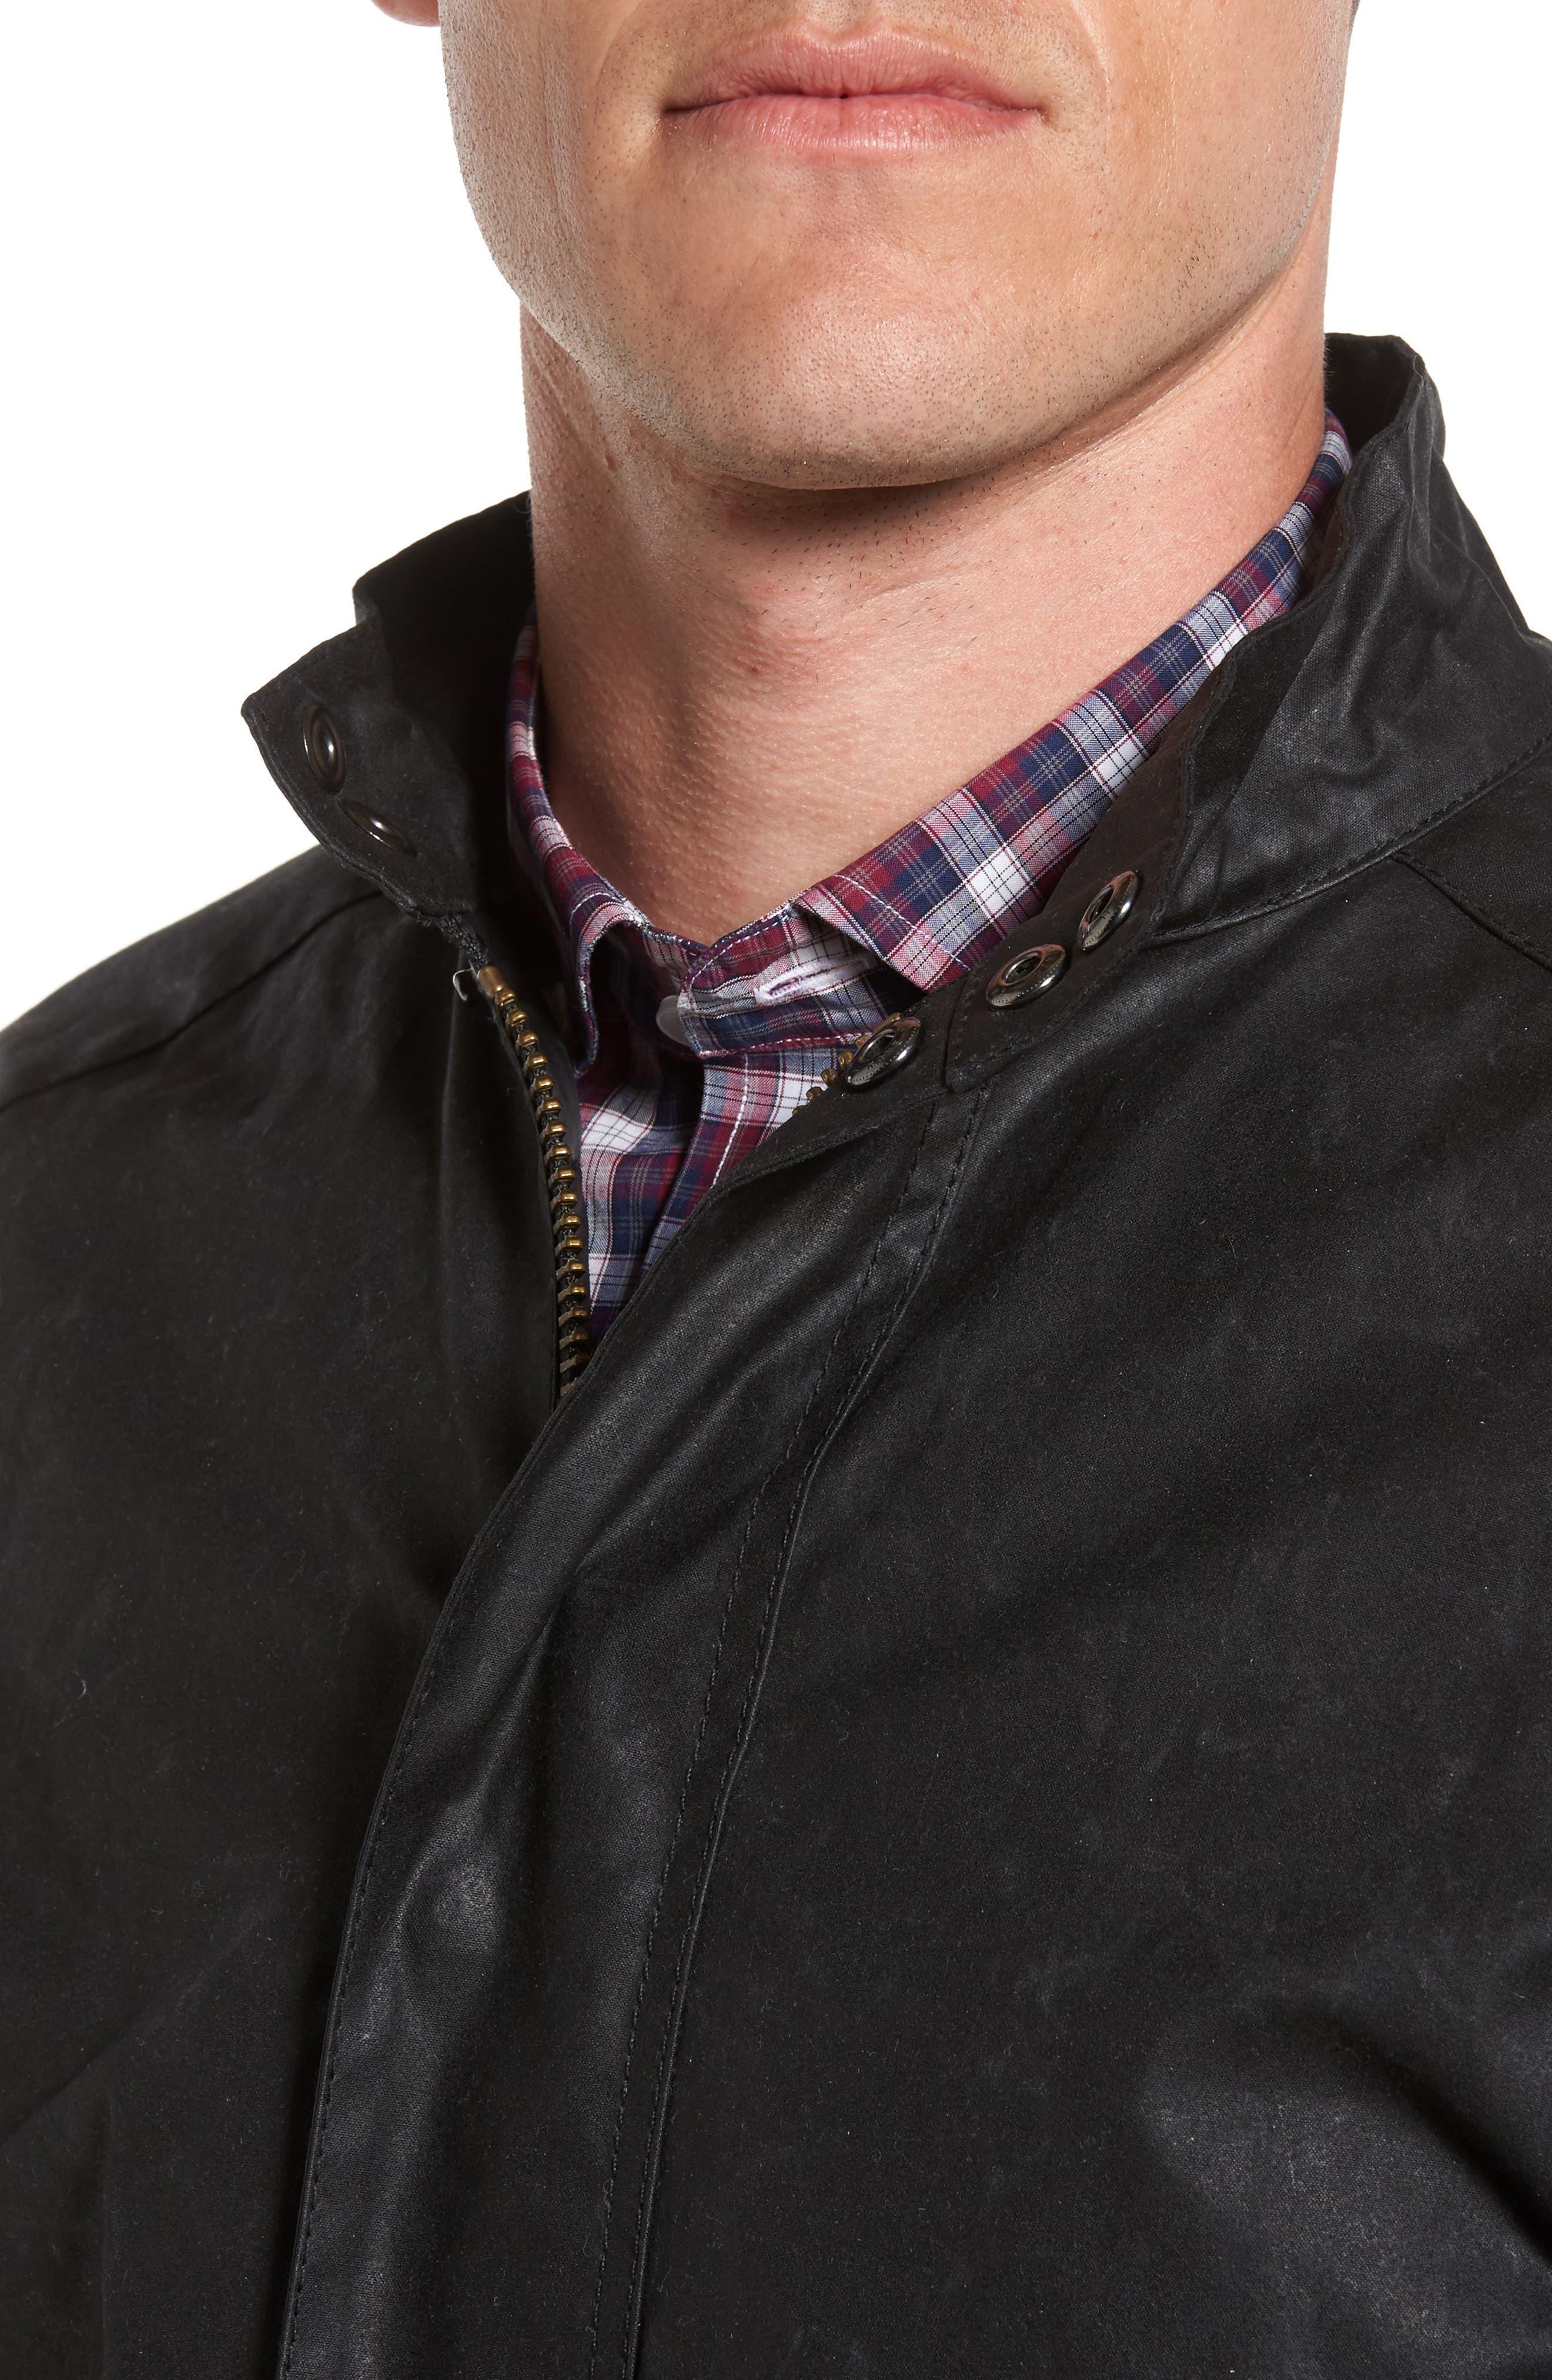 Chrome Slim Fit Water Repellent Jacket,                             Alternate thumbnail 4, color,                             Black